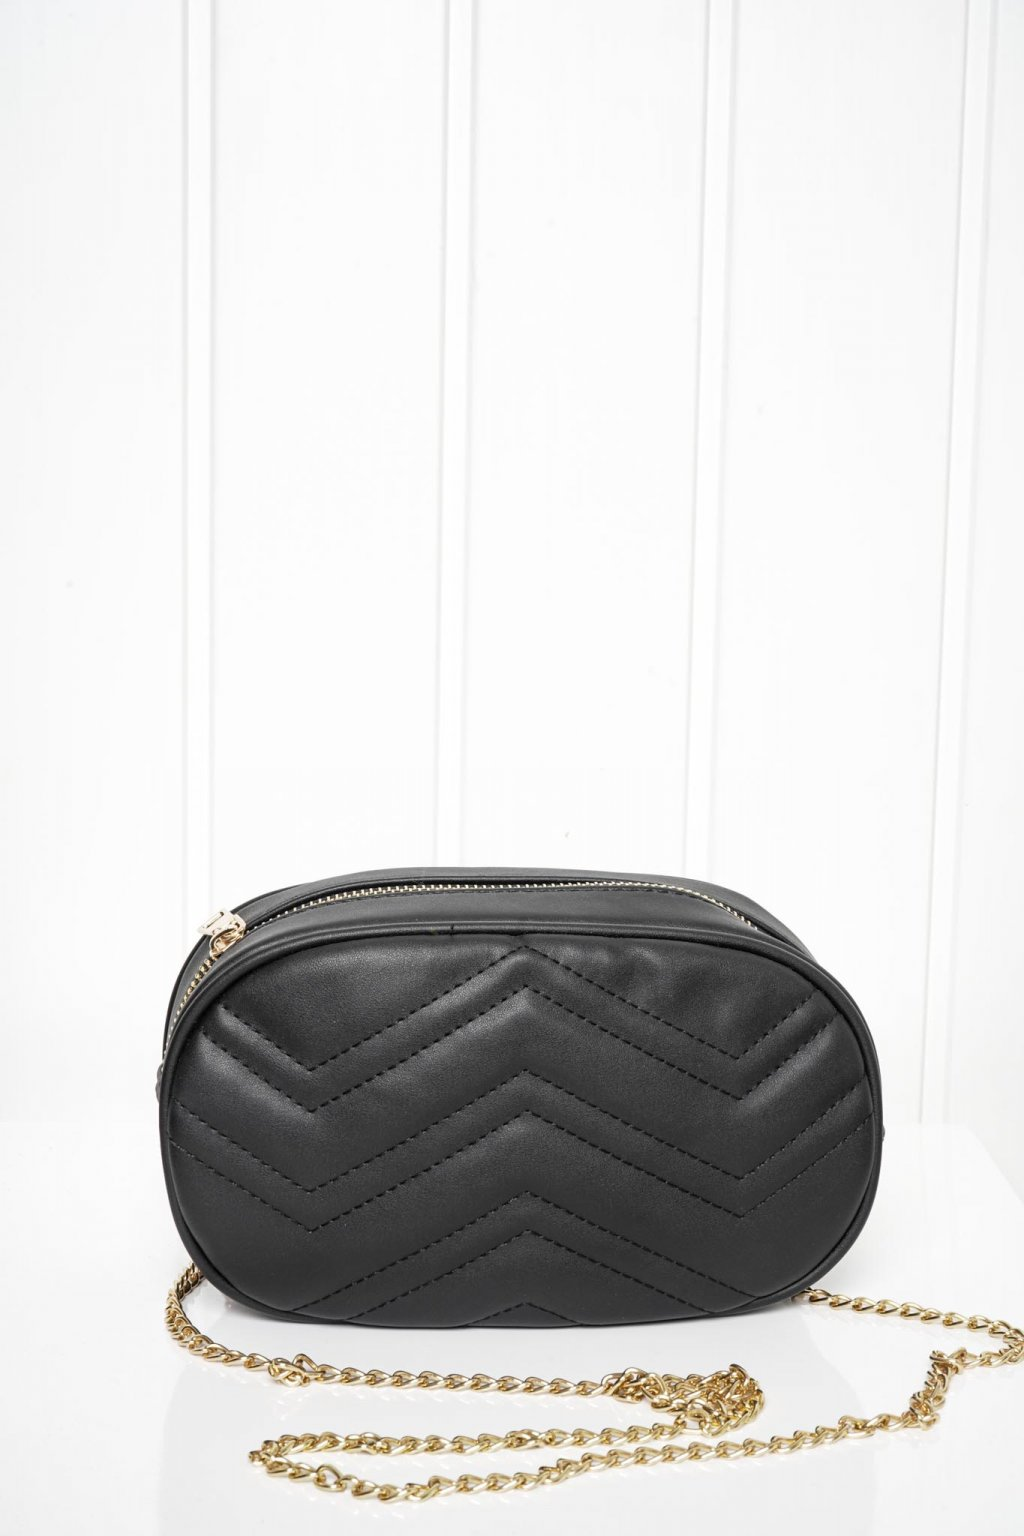 Kabelka, crossbody, ruksak, shopping bag, shopperka, 112